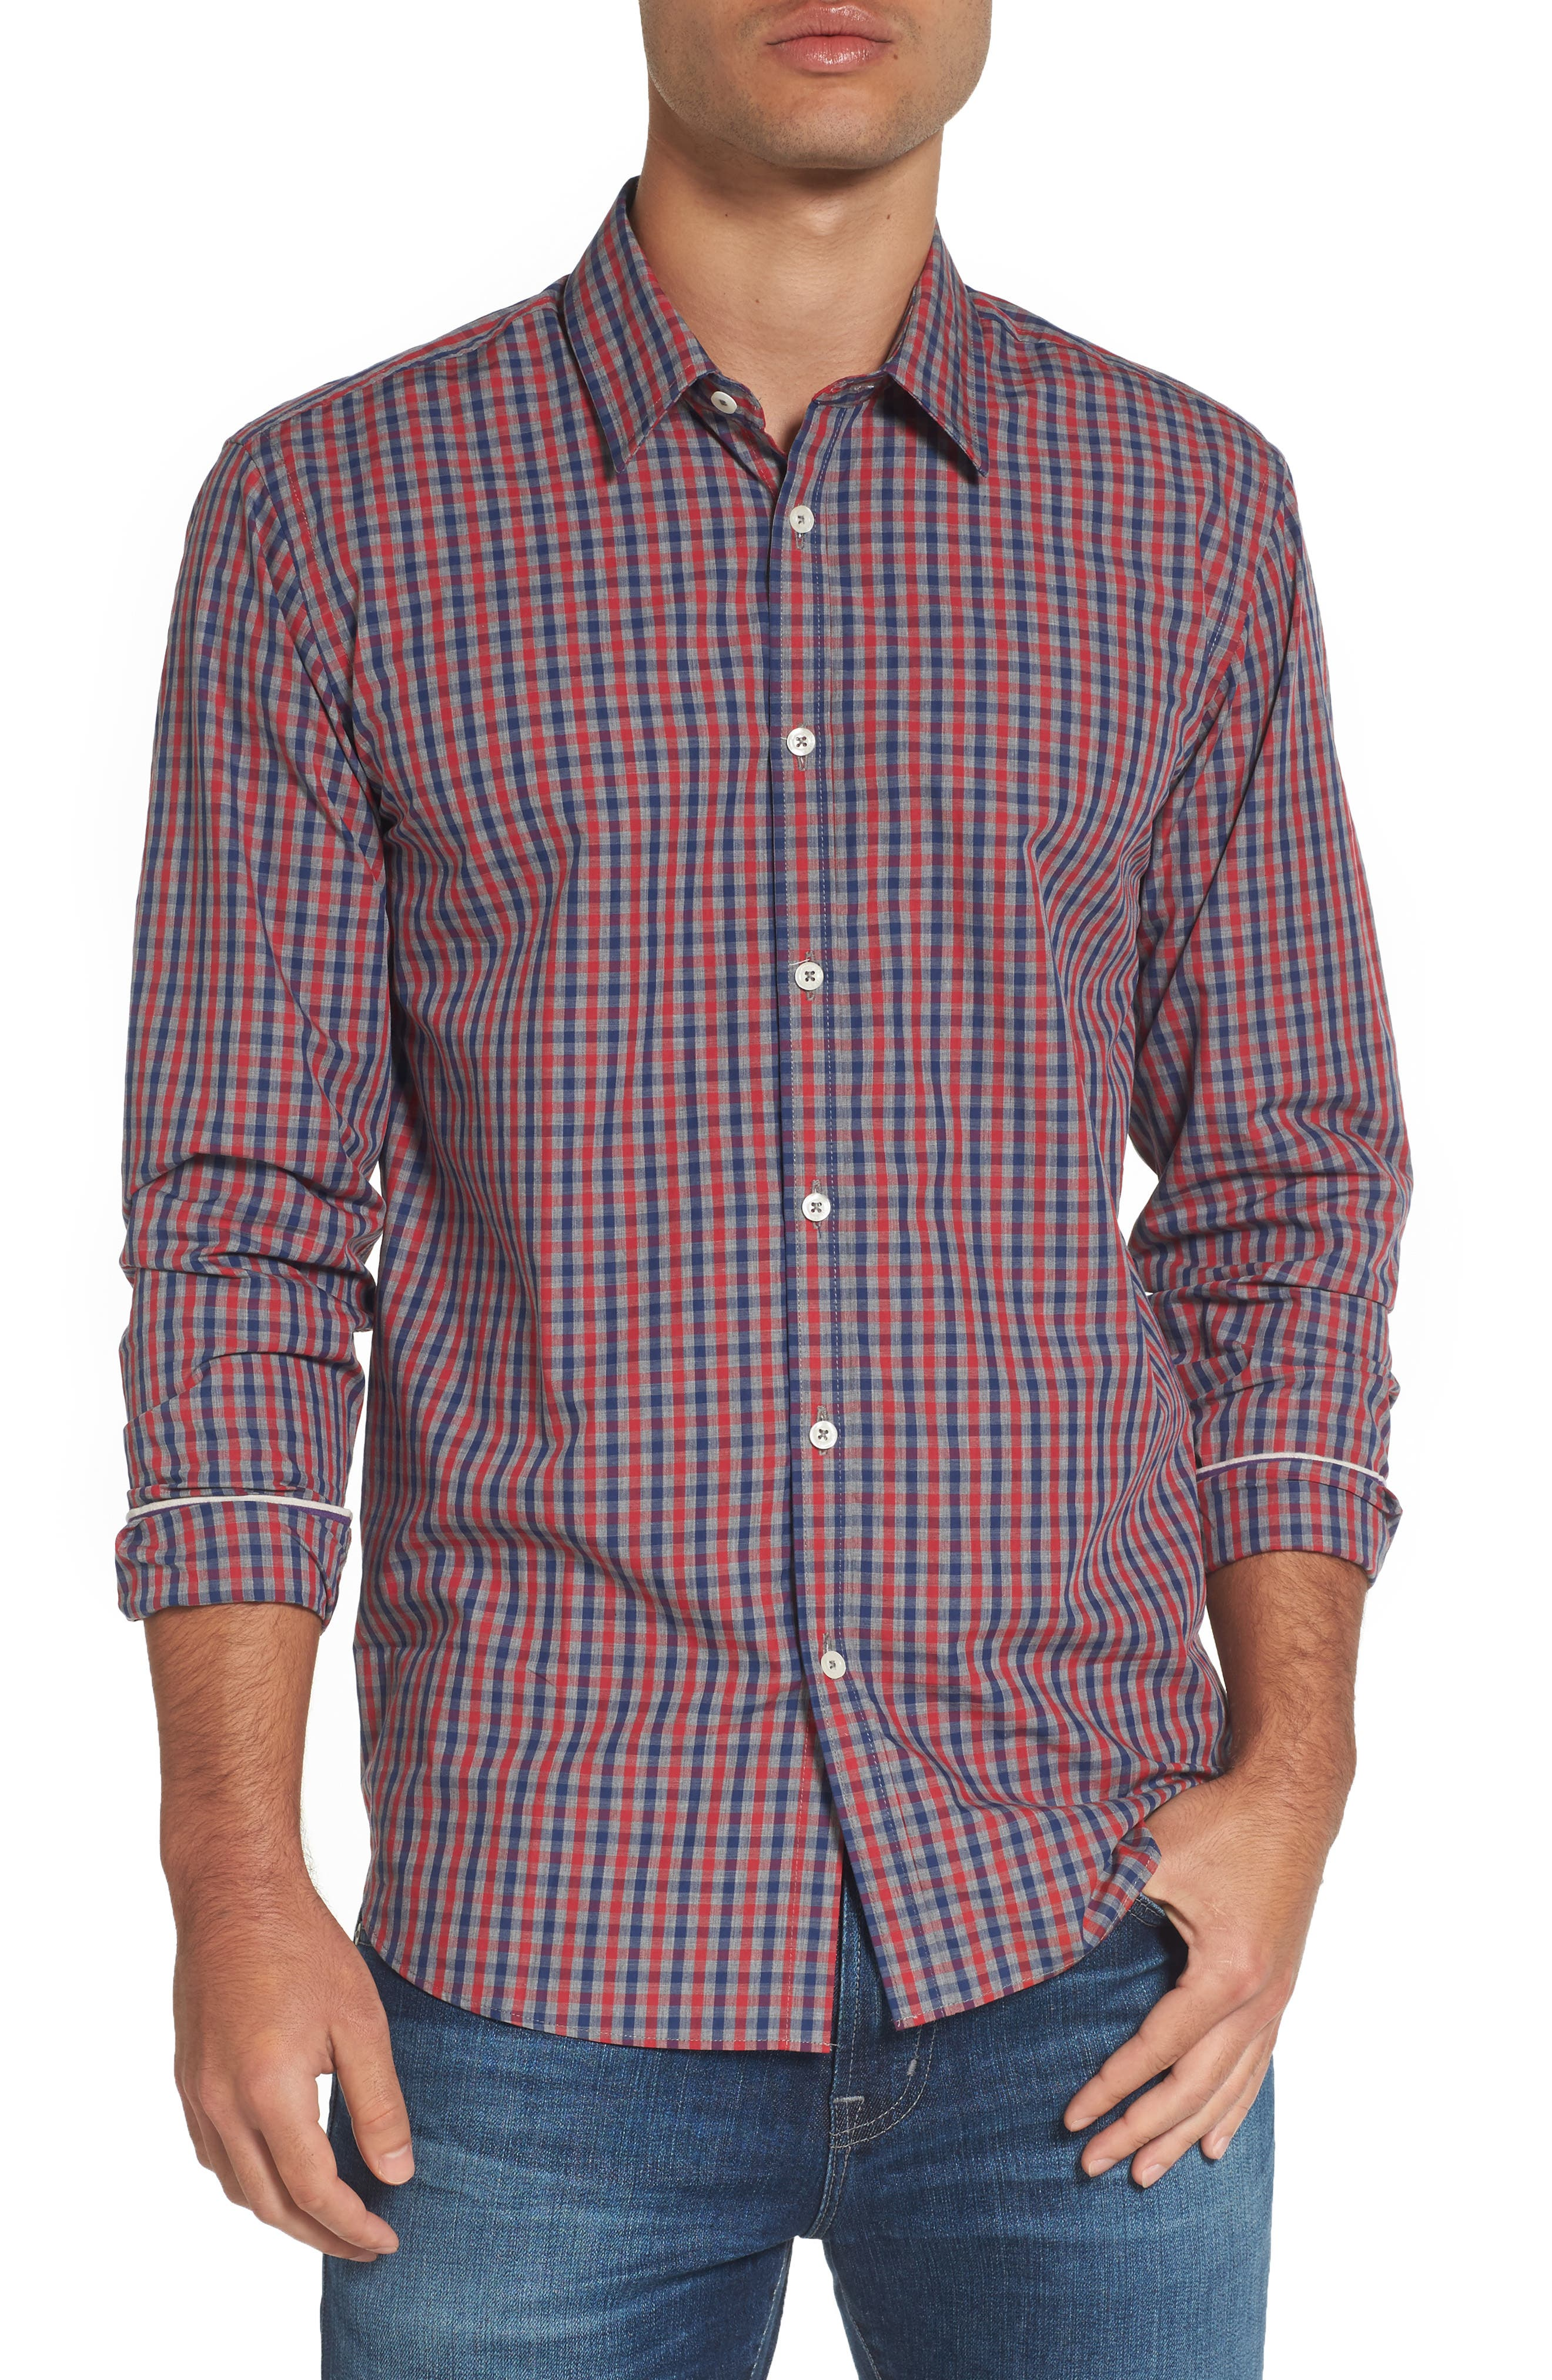 Jeremy Argyle Comfort Fit Check Sport Shirt